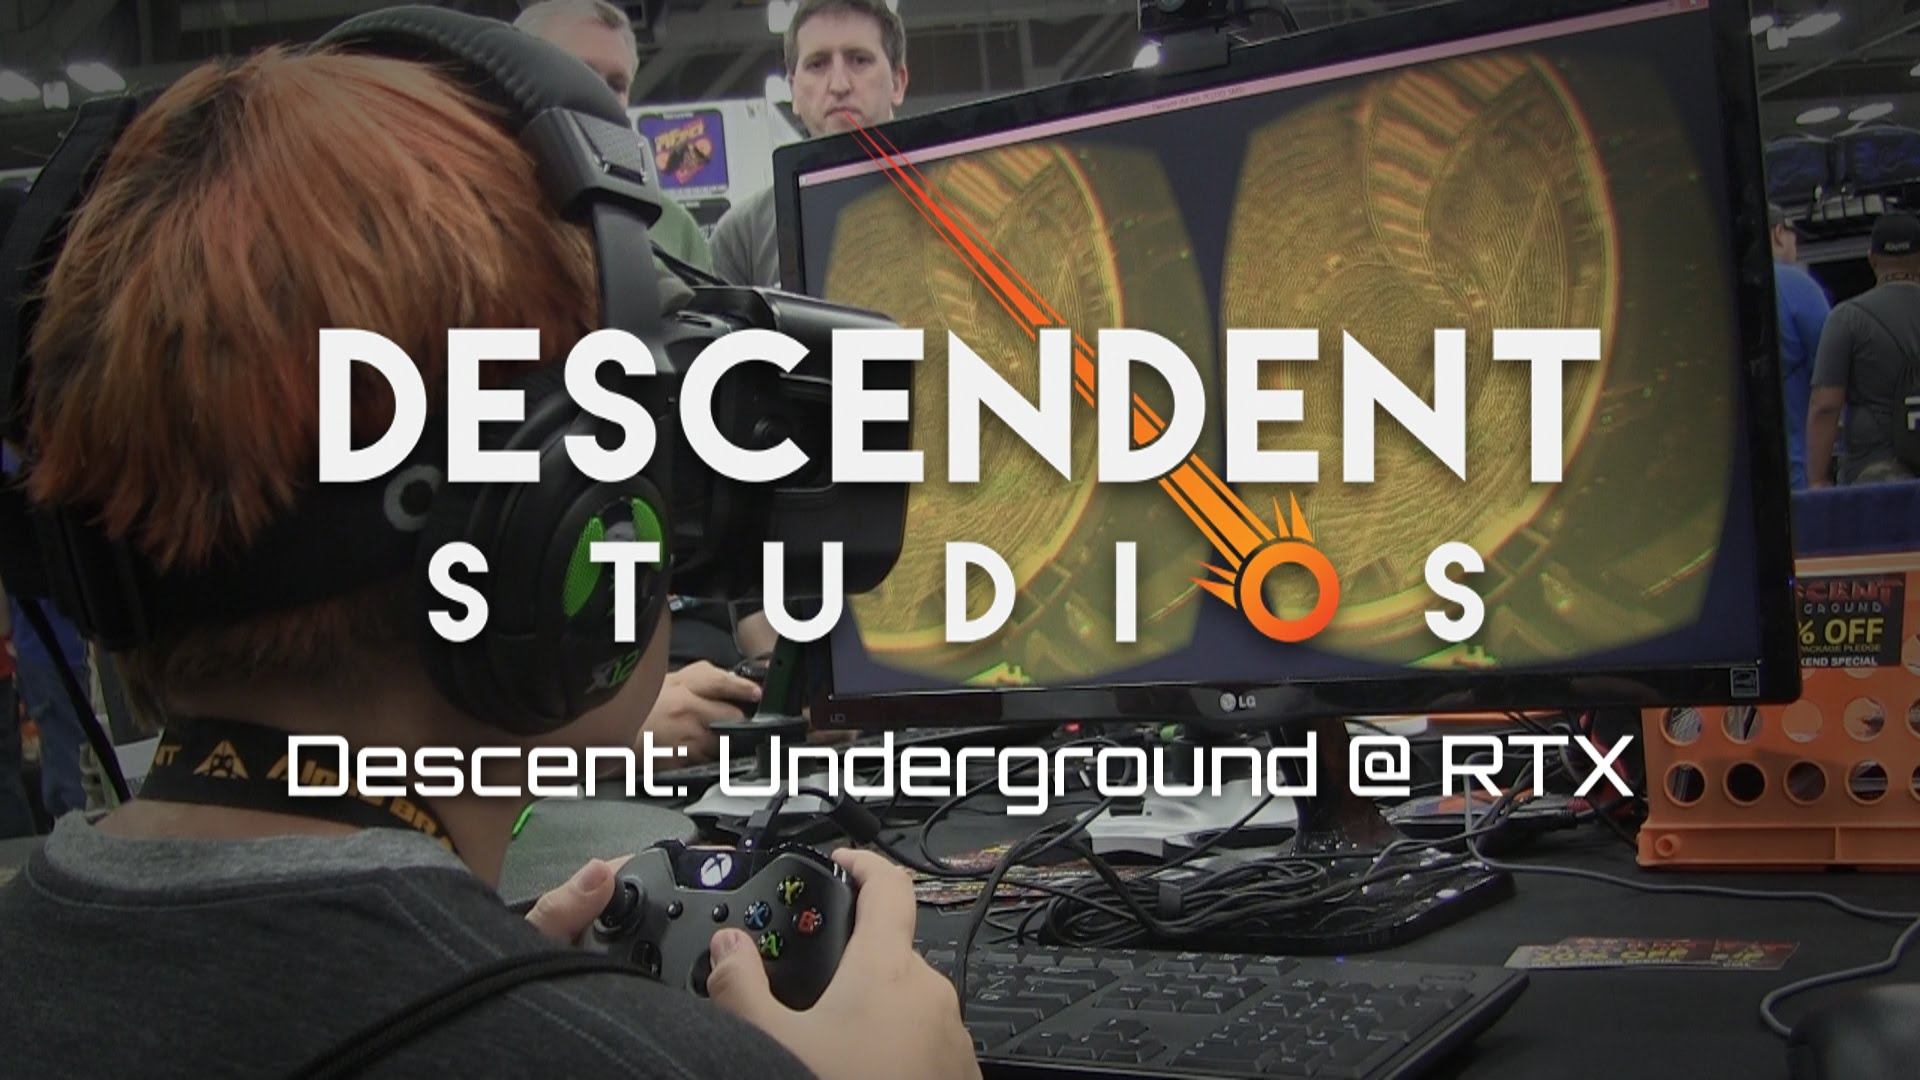 Descent: Underground @ RTX 2015 video thumbnail